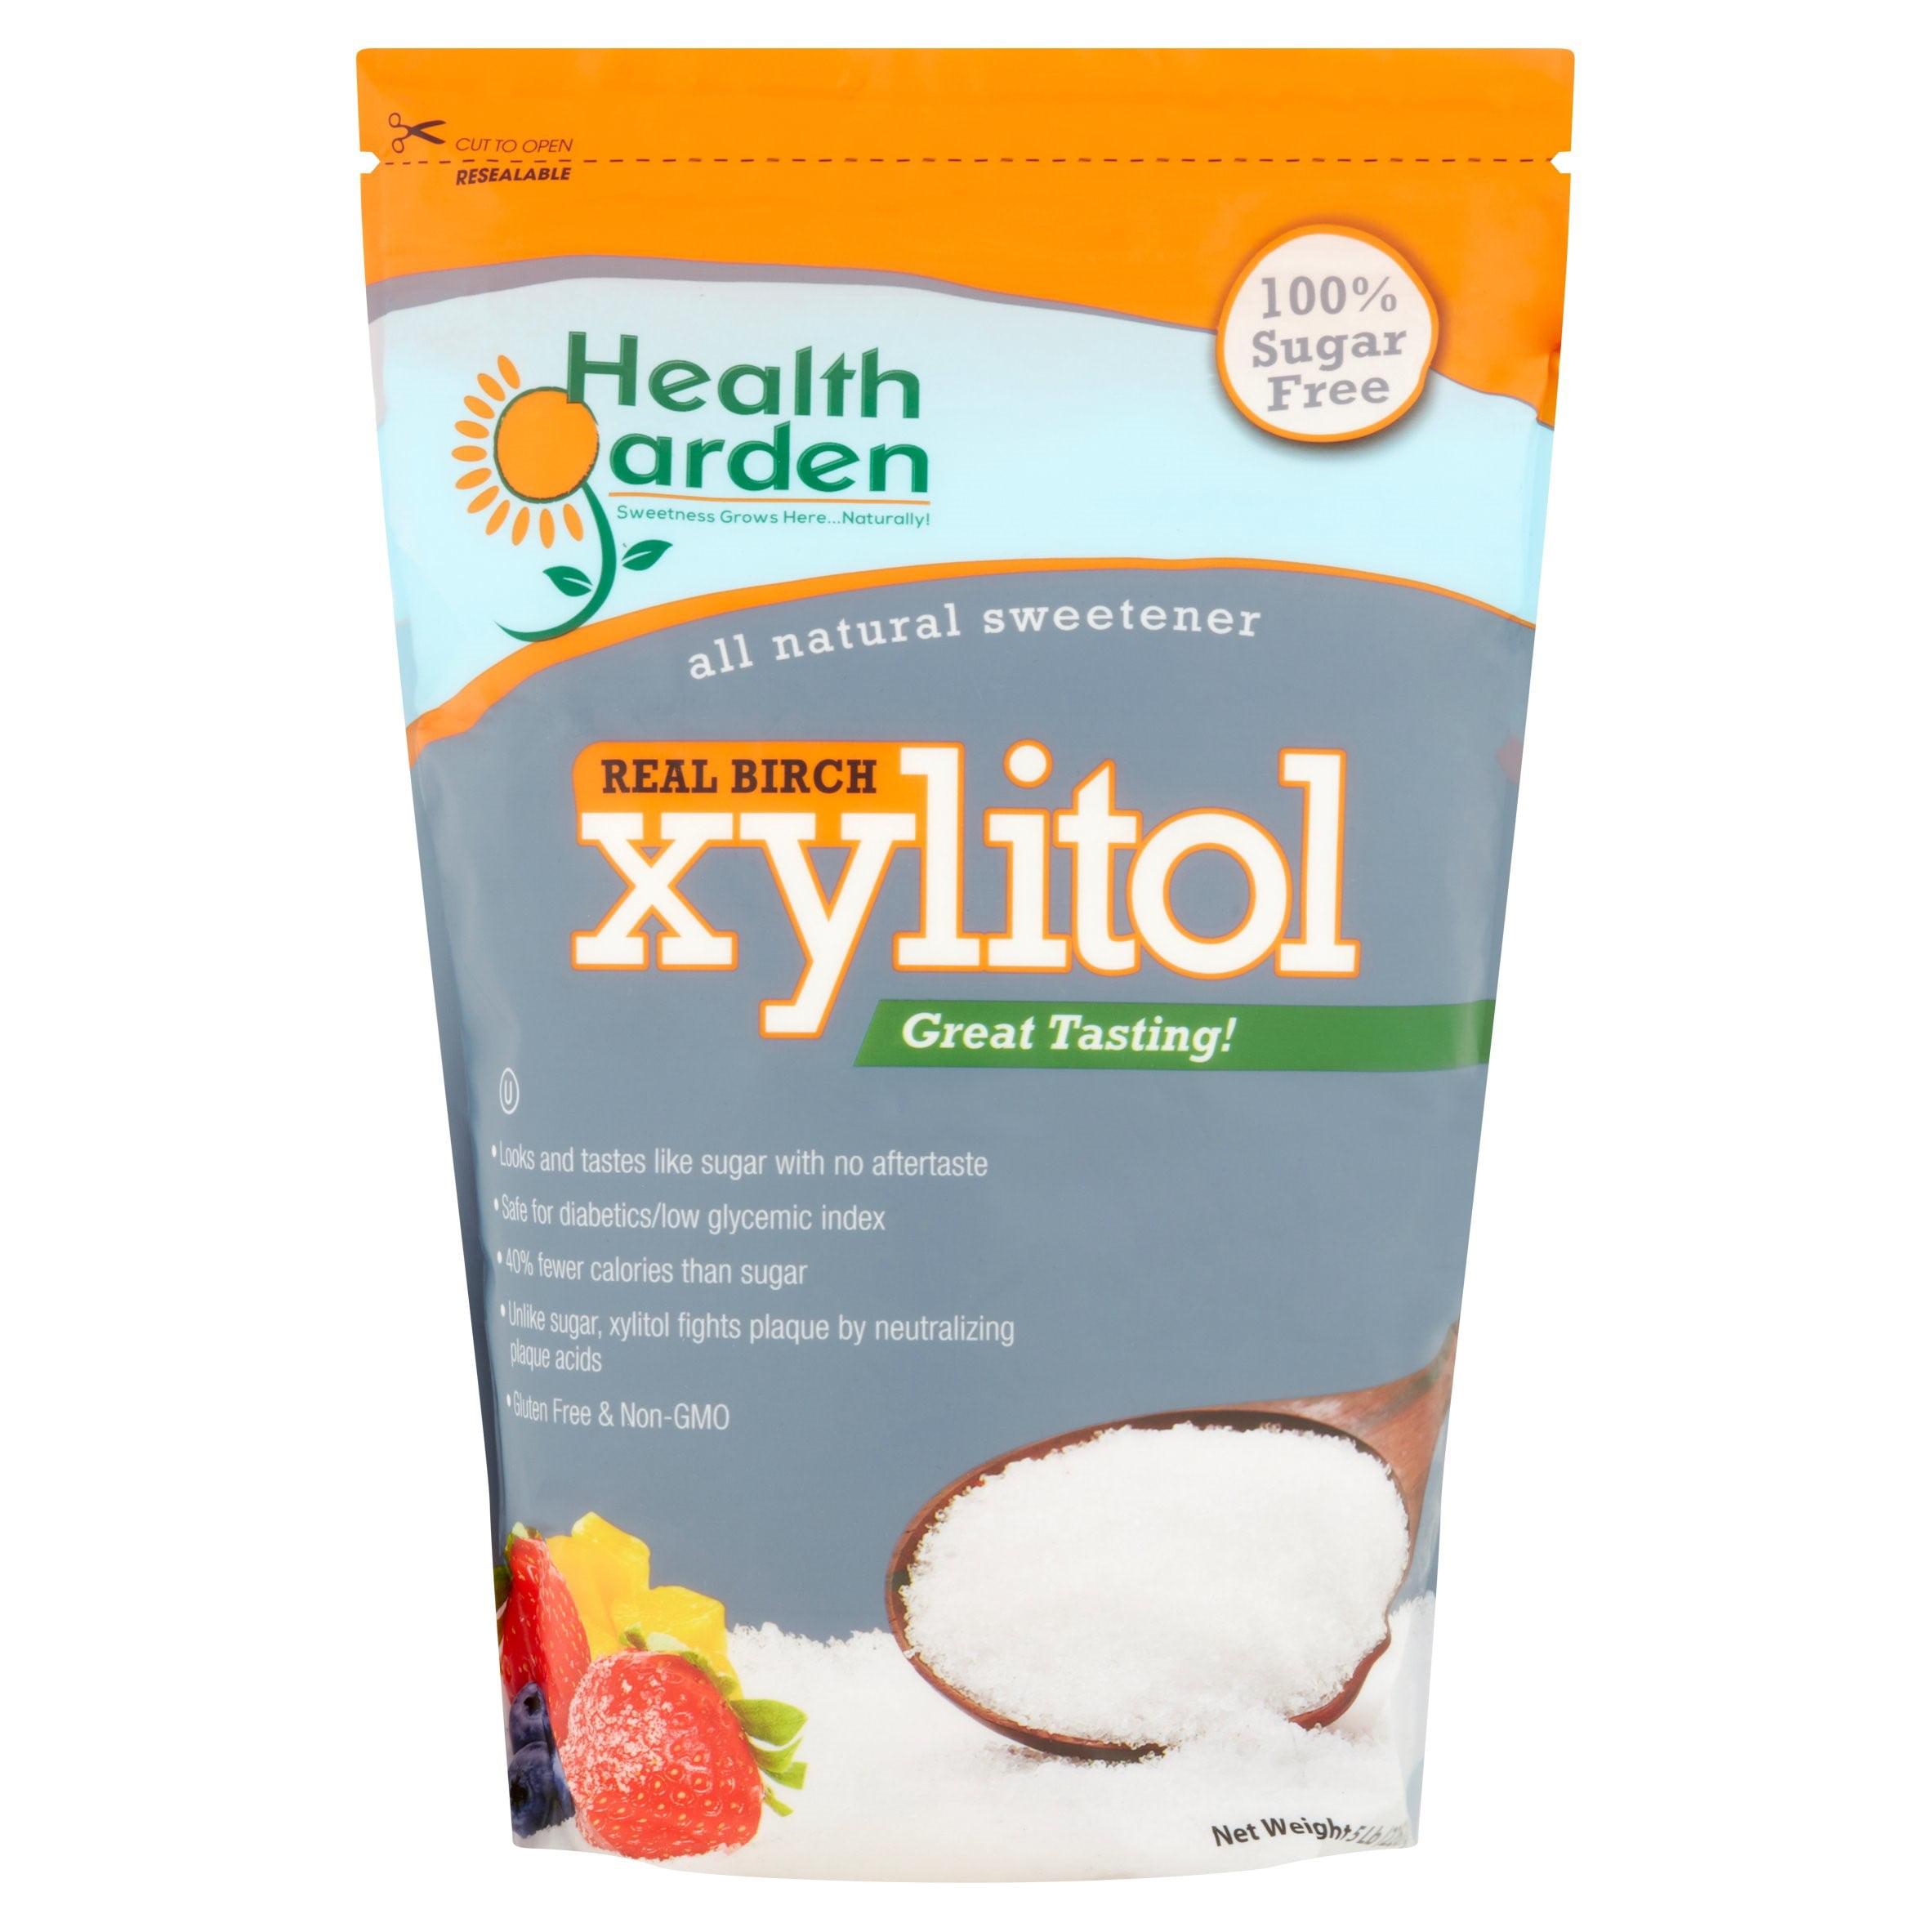 Health Garden Xylitol Sweetener, 5 Lb